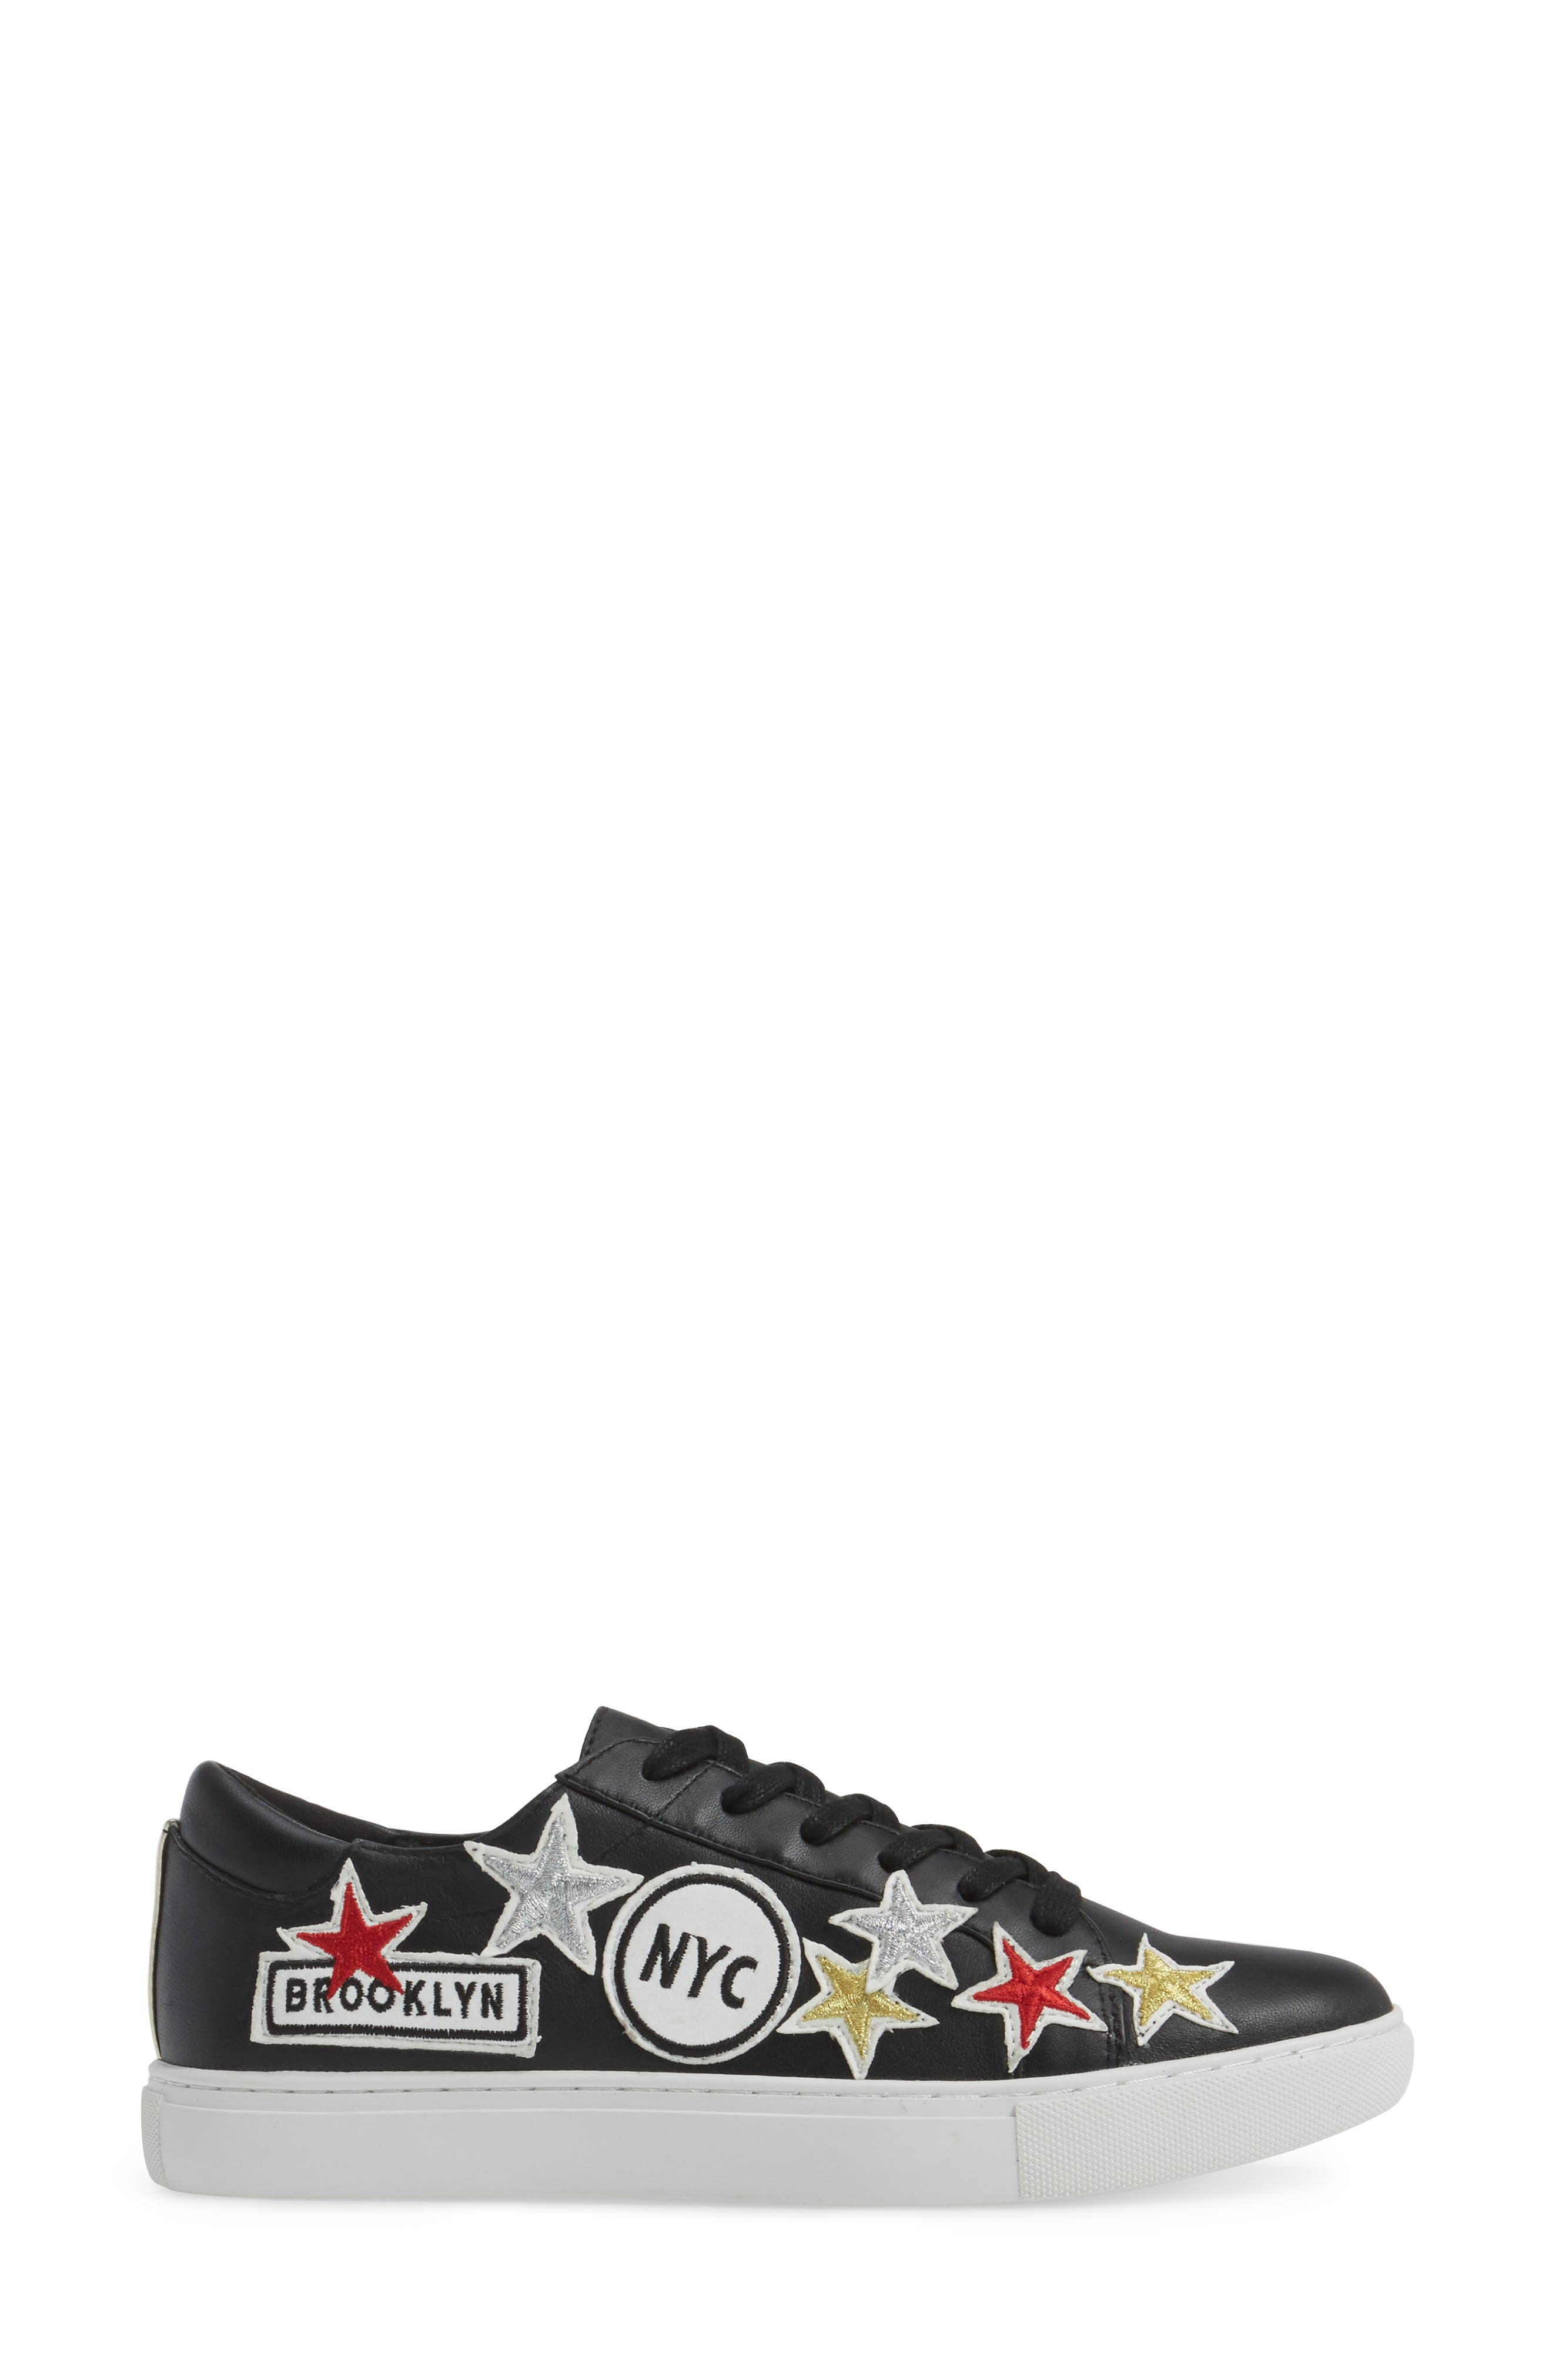 Kam NYC Sneaker,                             Alternate thumbnail 5, color,